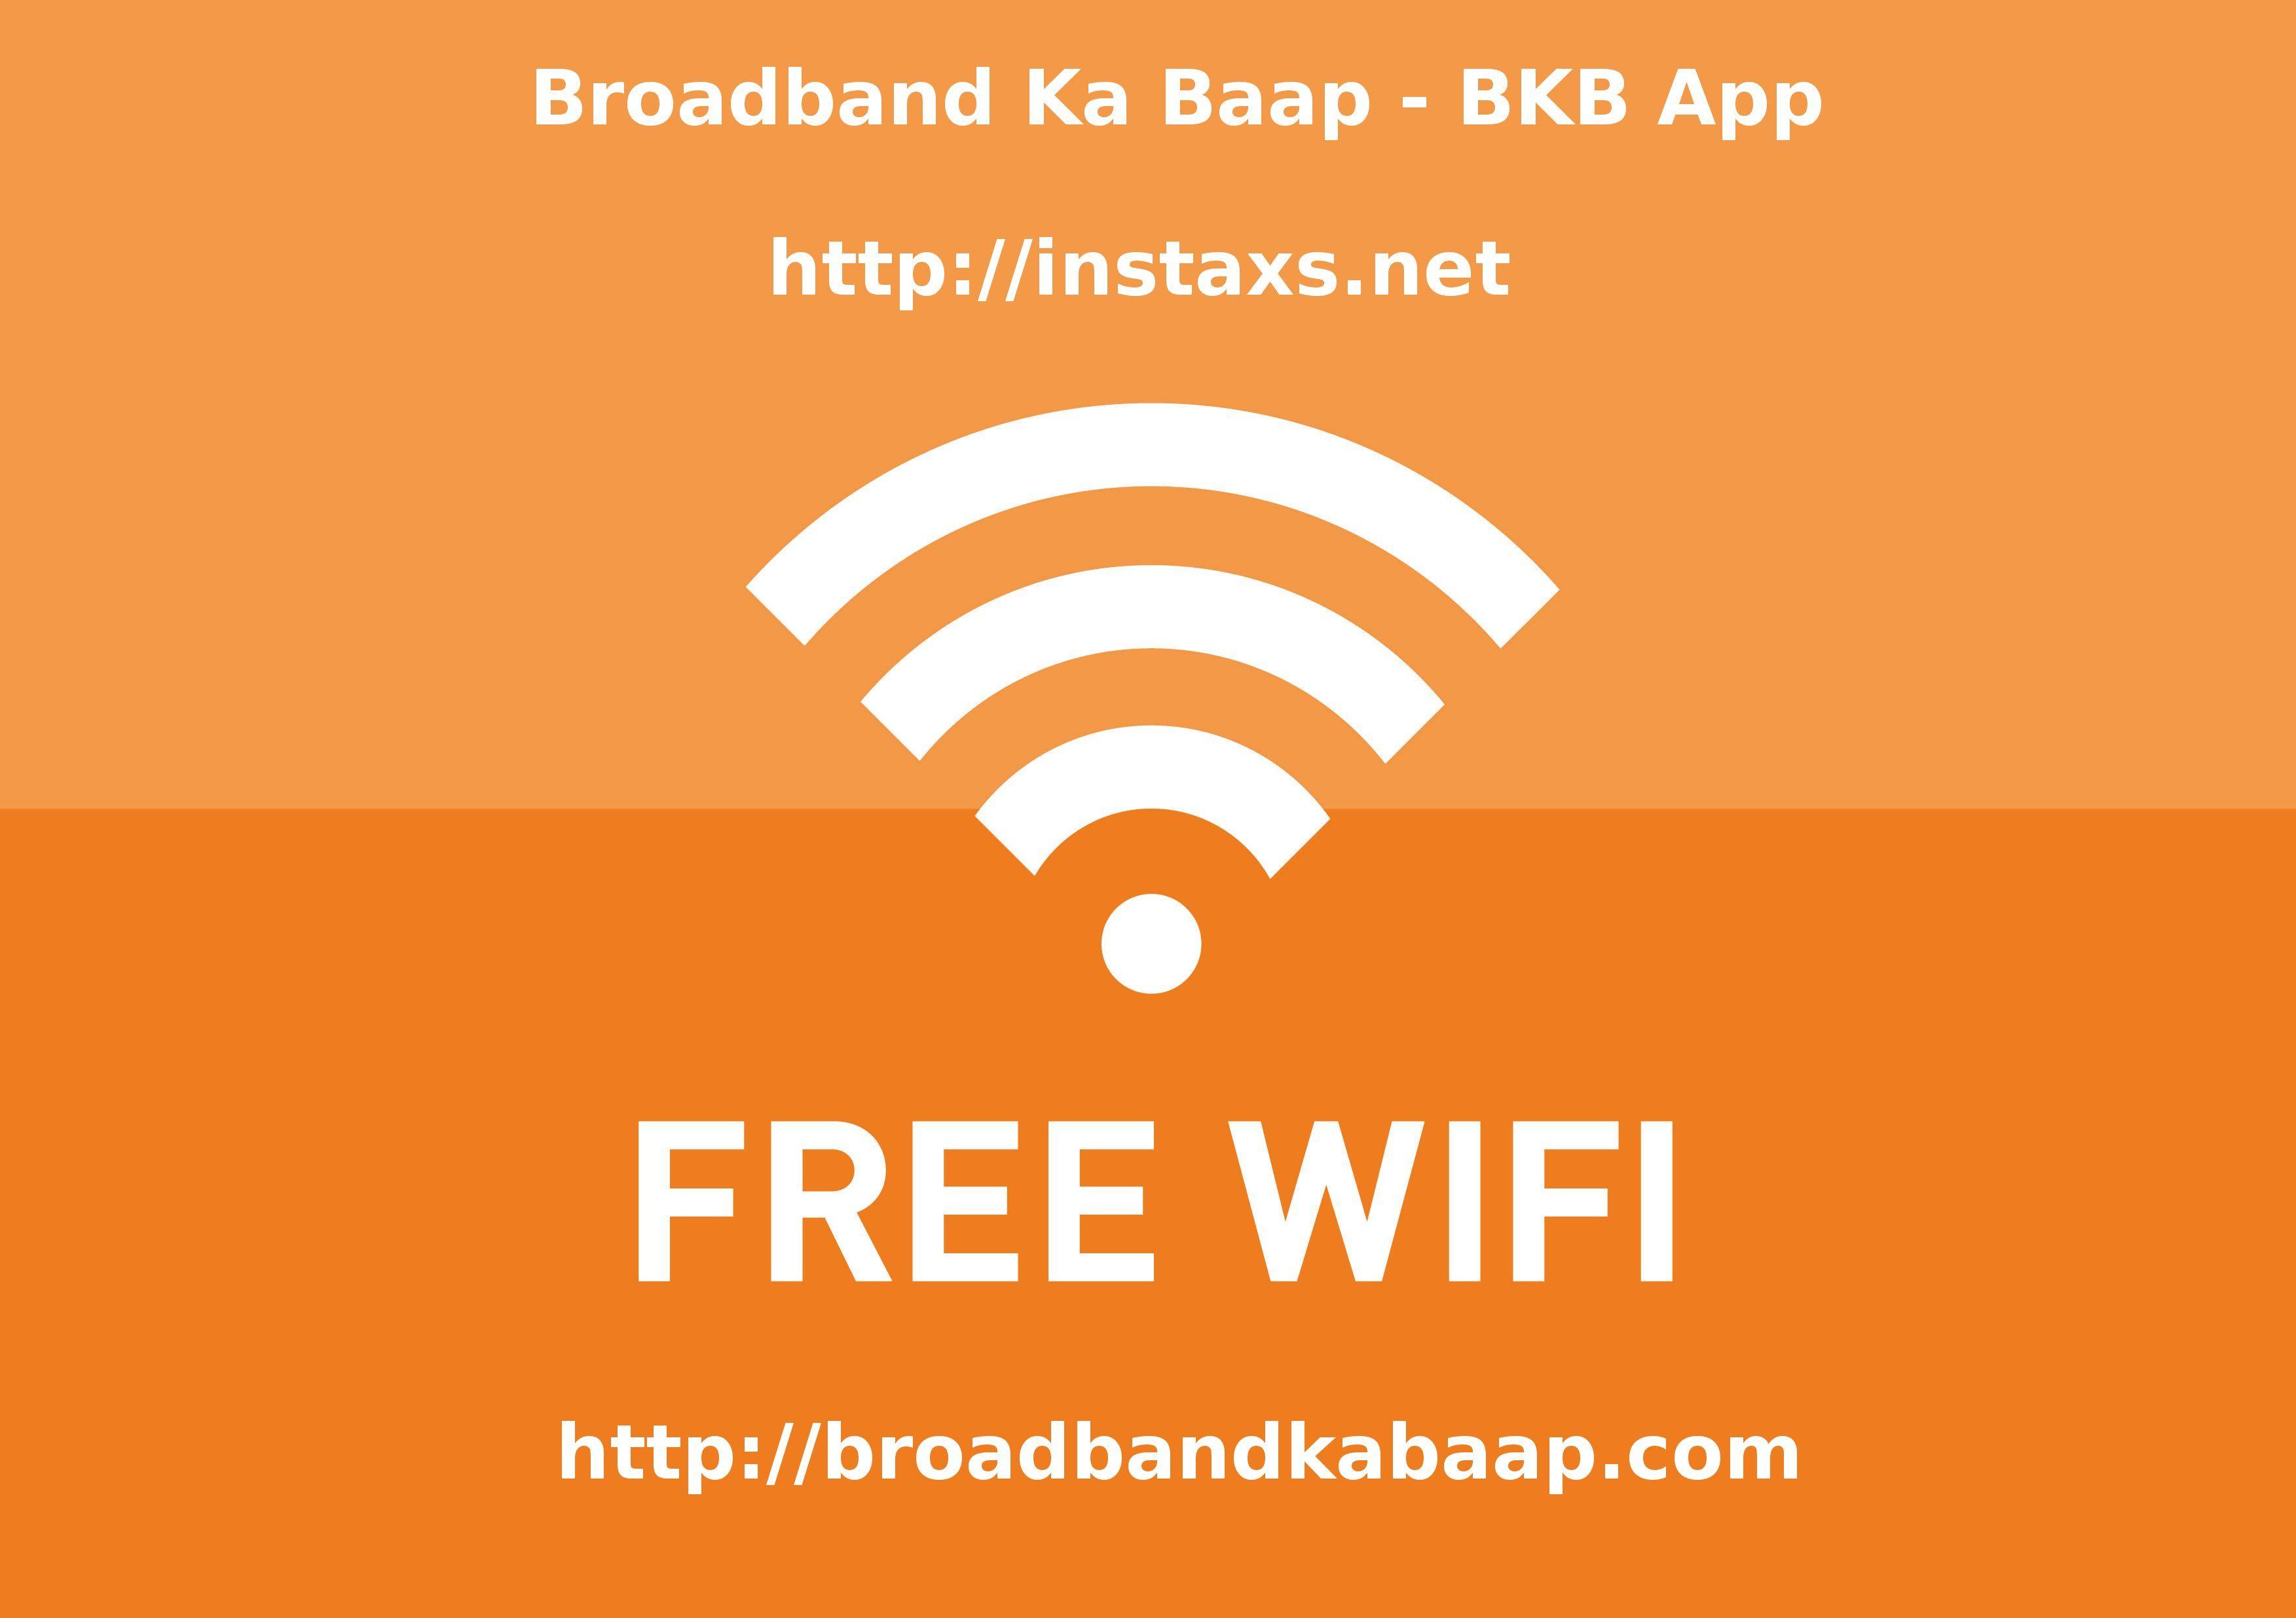 Enjoy Free Internet Wi Fi With Broadband Ka Baap Hotspots Across Chandigarh Mohali And Punchkula Get Instant Activation Enjoy Wifi Internet Wifi Broadband